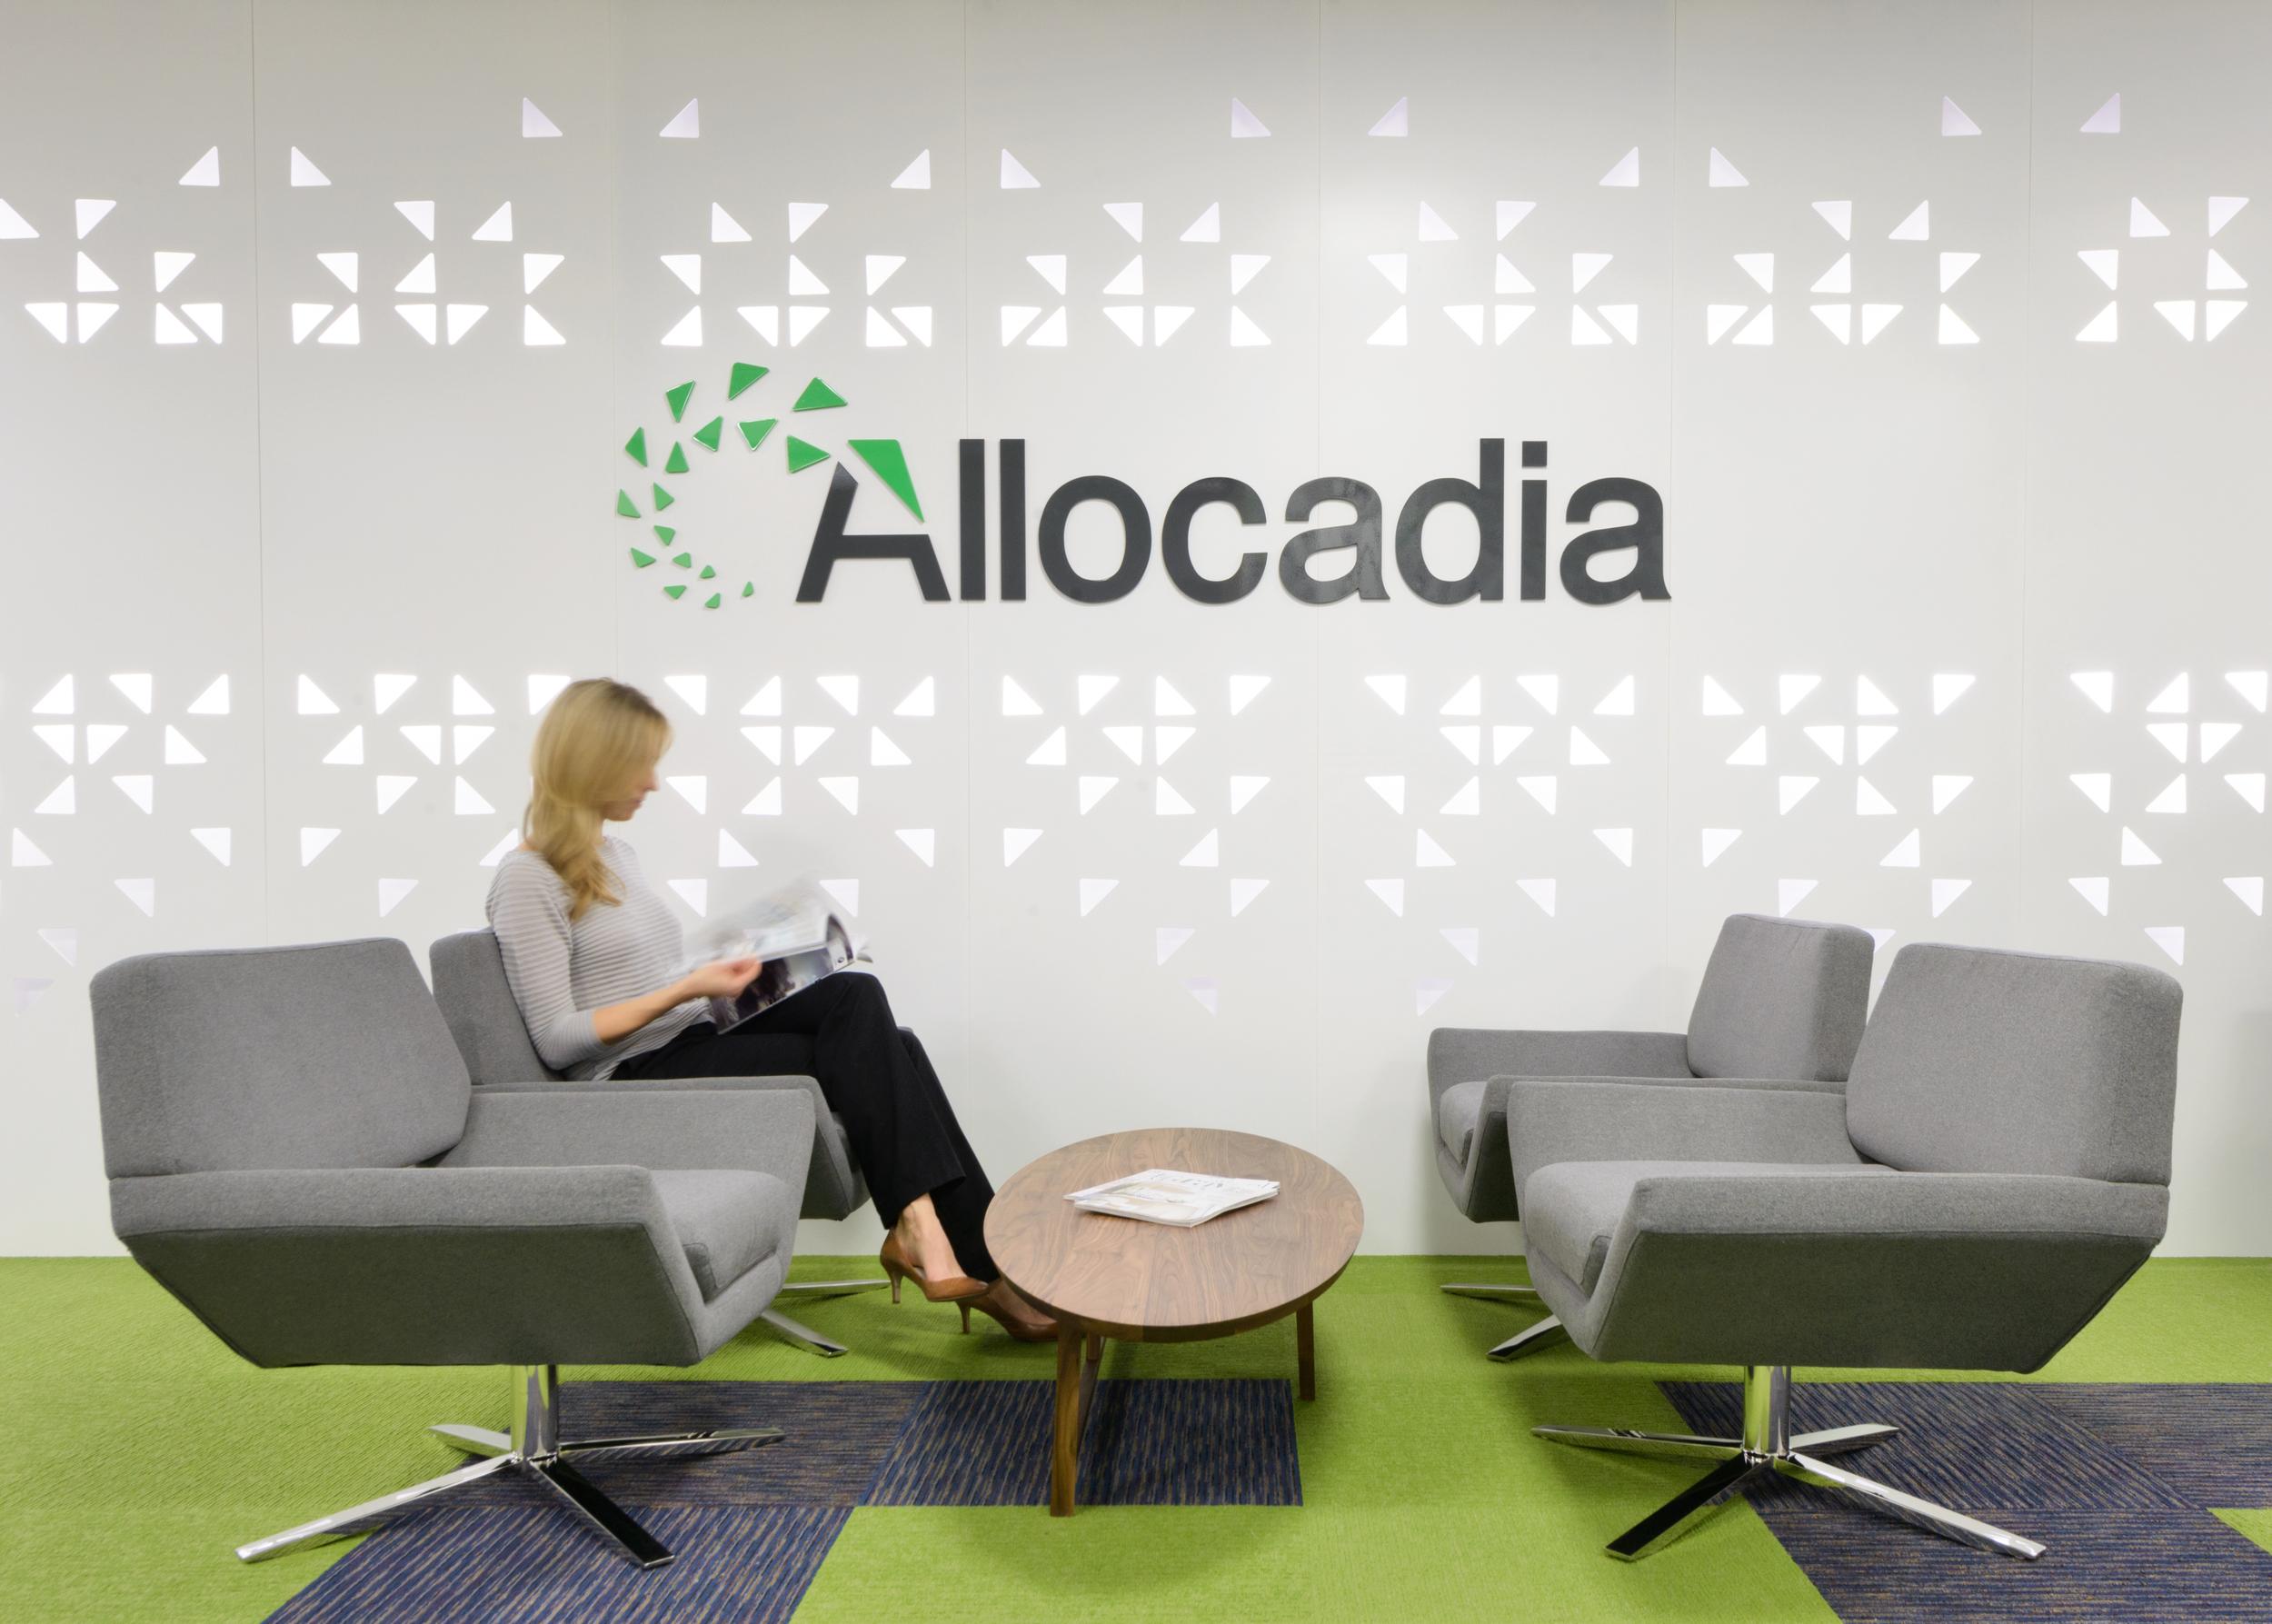 Allocadia-004.jpg